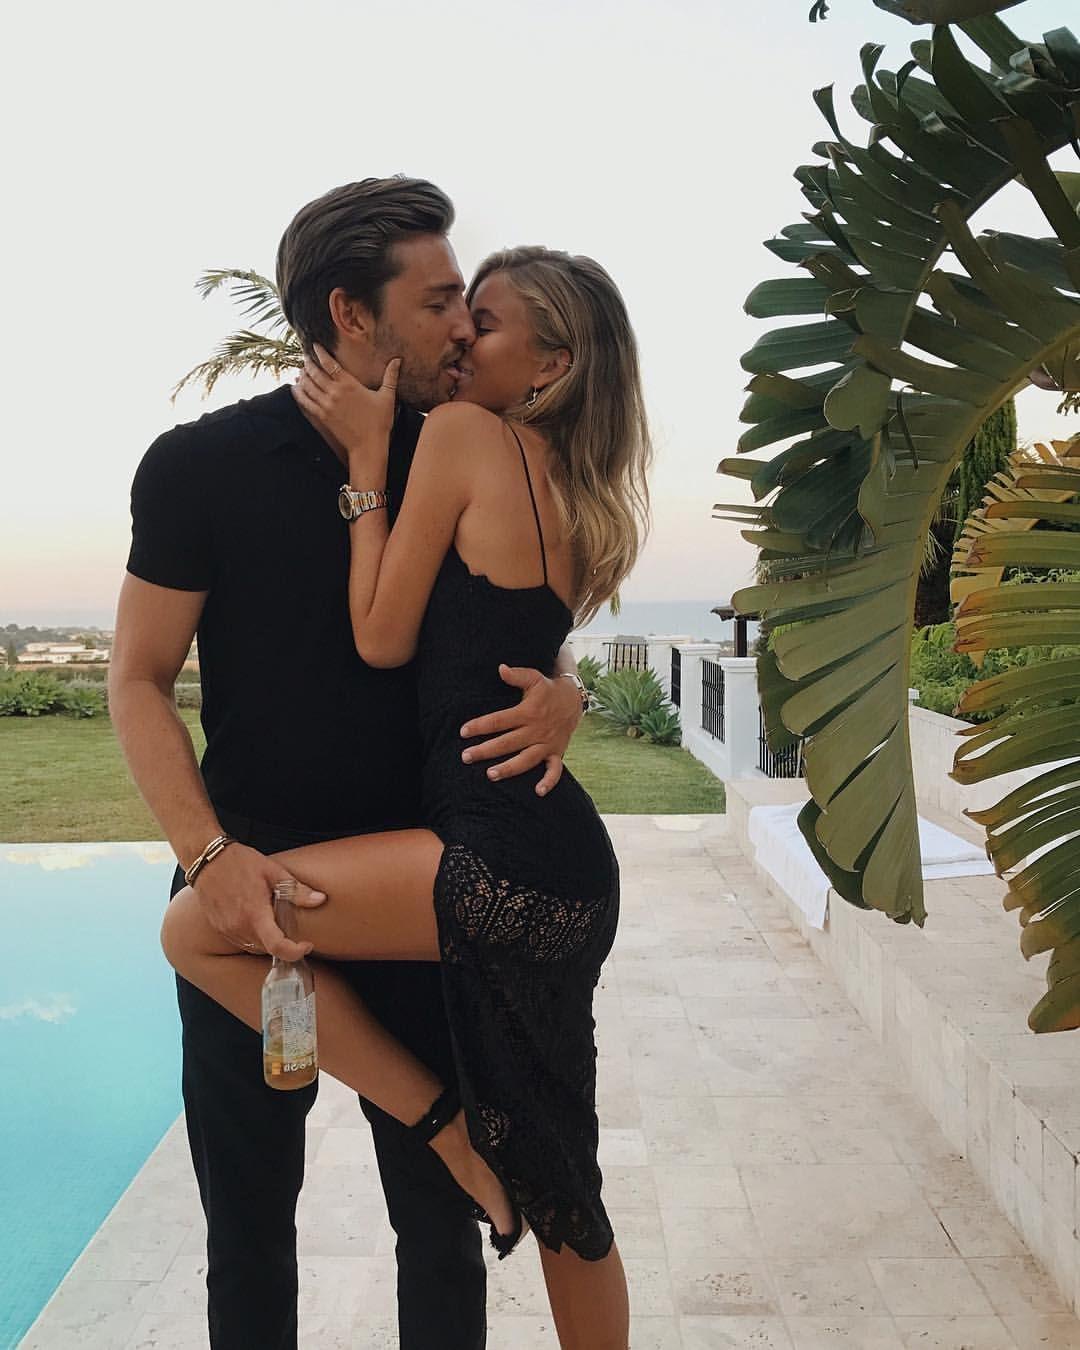 43 dating 26 camerele de chat flirtează dating